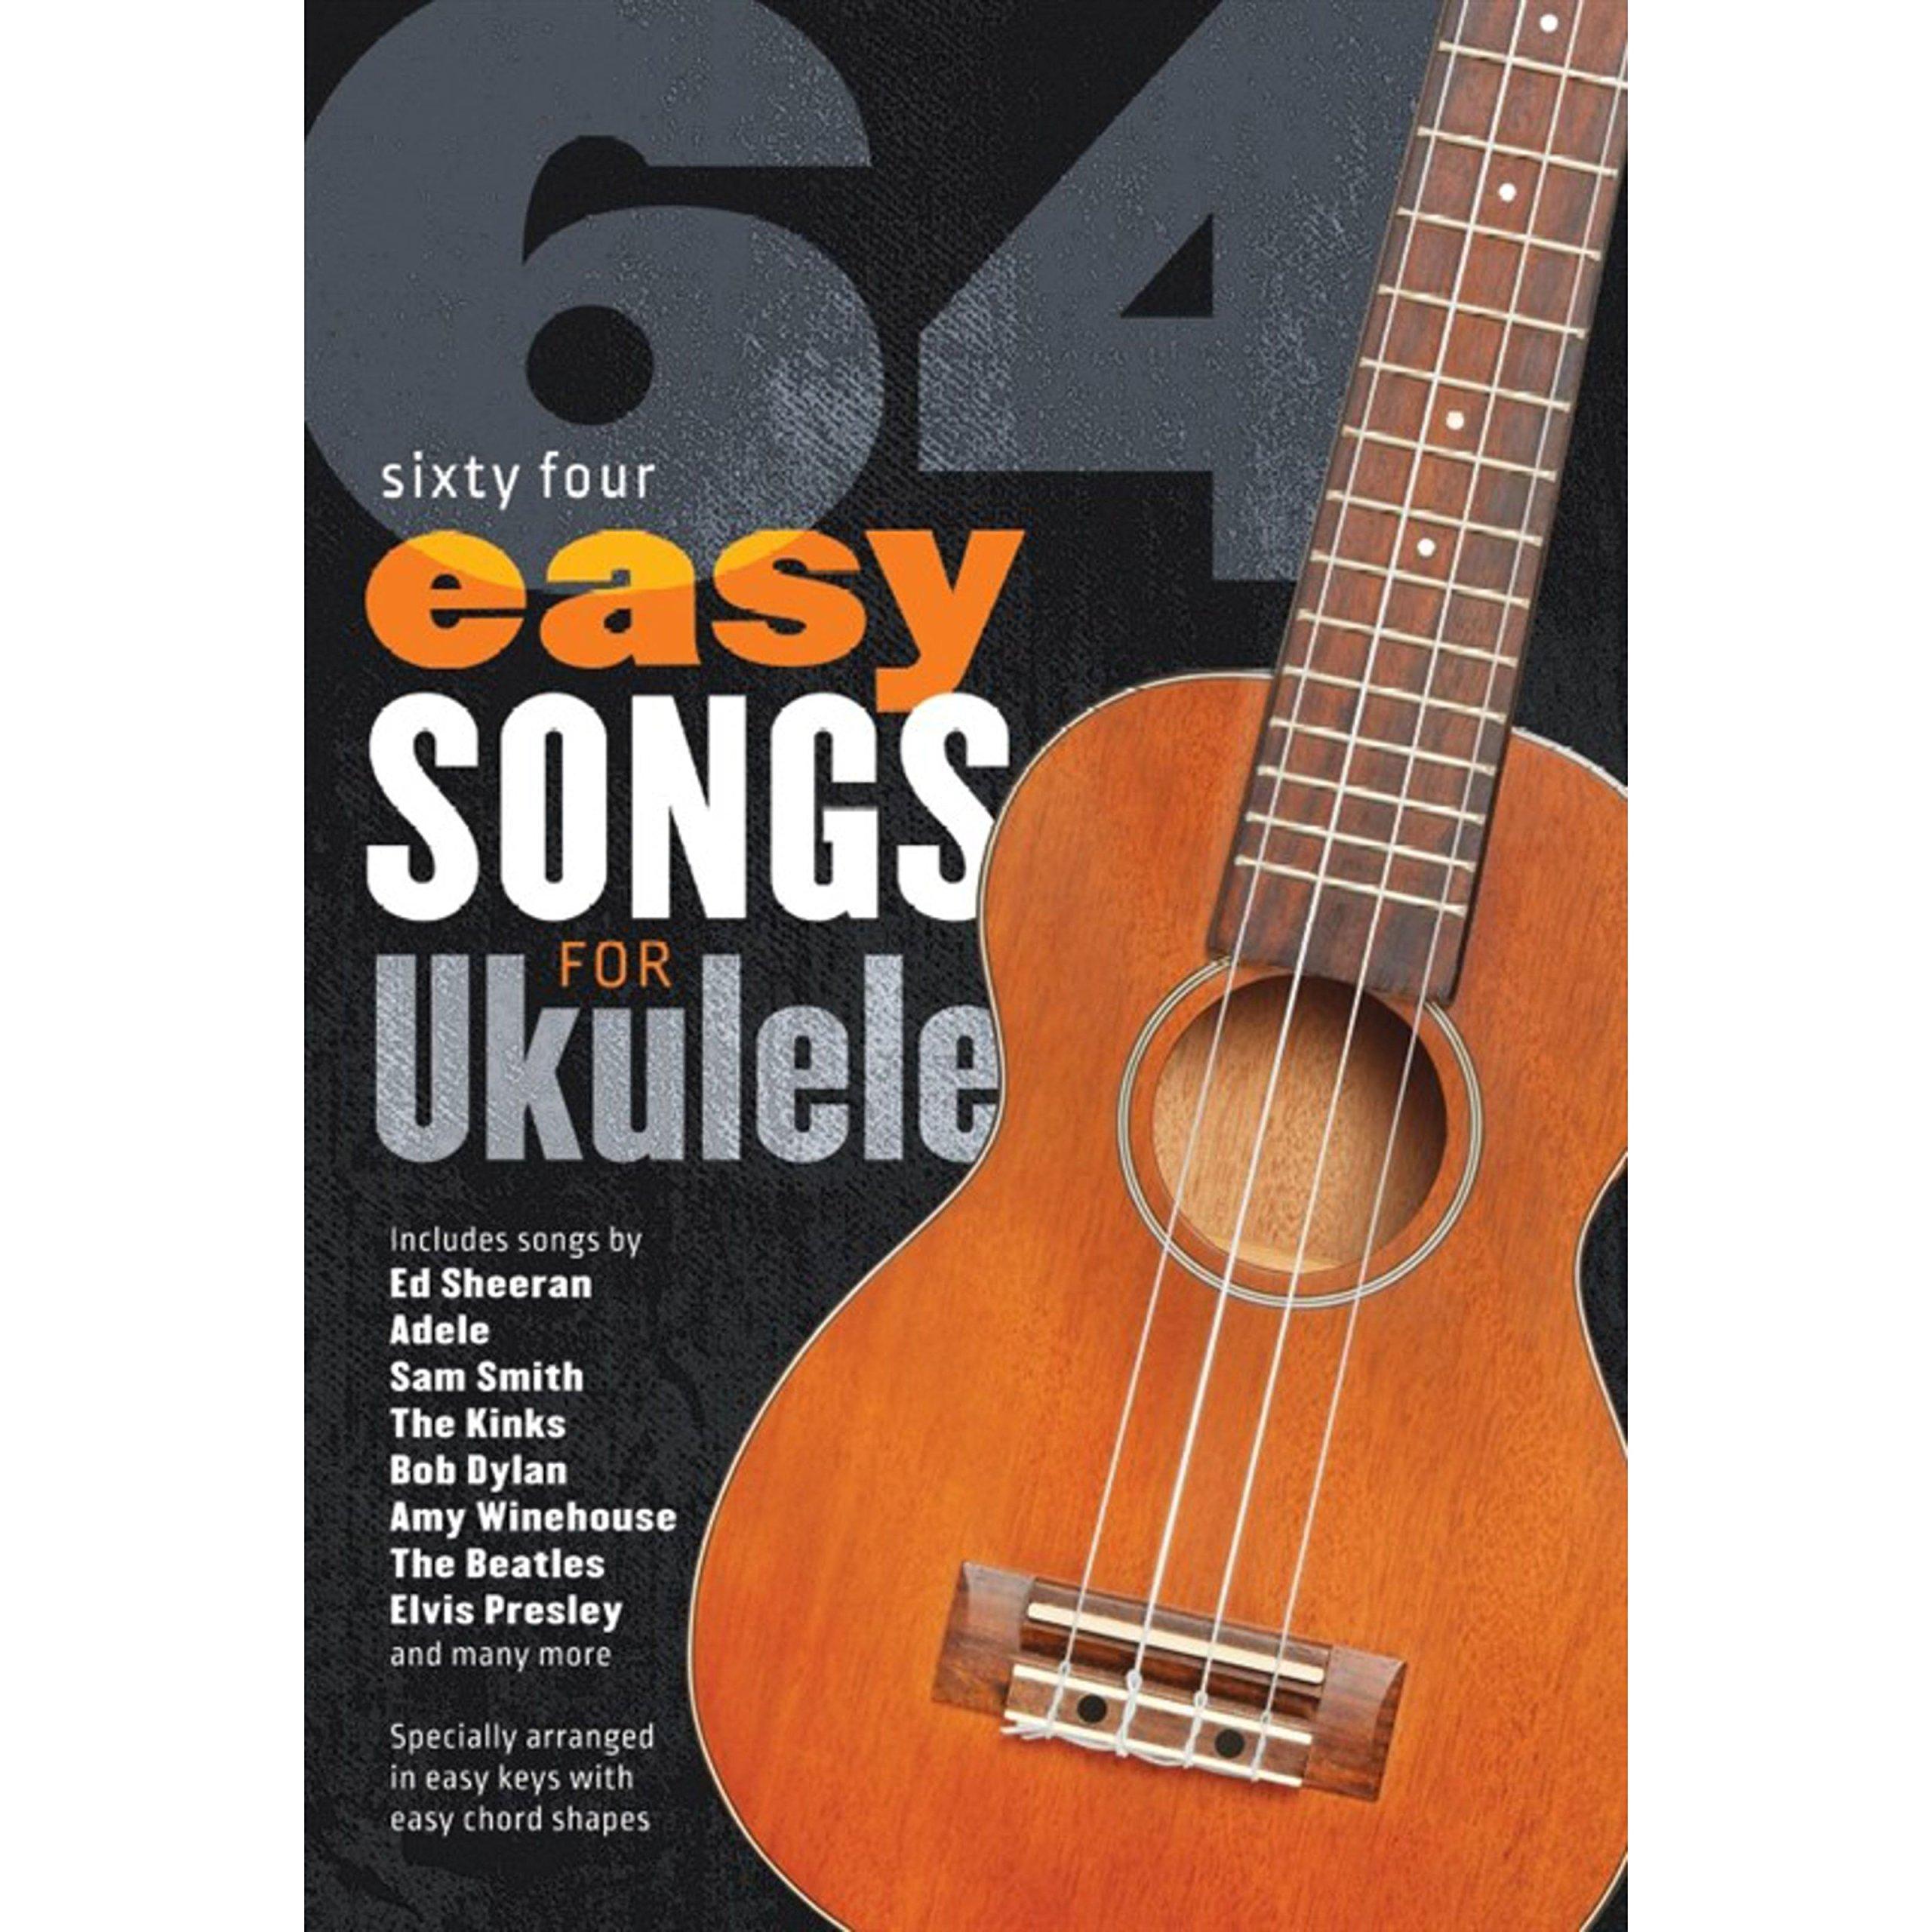 64 Easy Songs For Ukulele: Amazon co uk: Various: Books